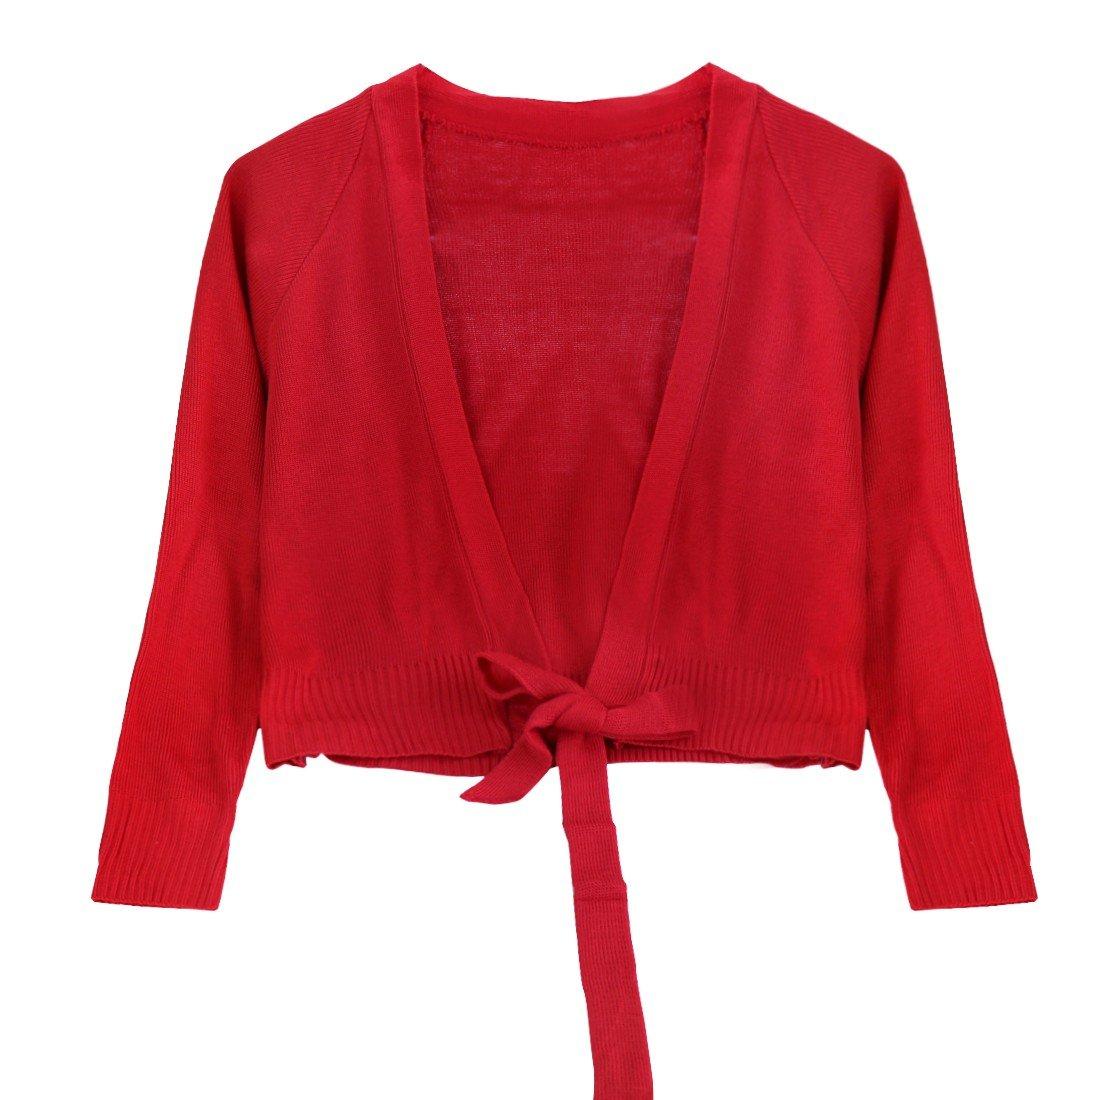 ACSUSS Kids Girls Long Sleeve Front Knot Gymnastics Ballet Dress Shrug Sweater Cardigan Top